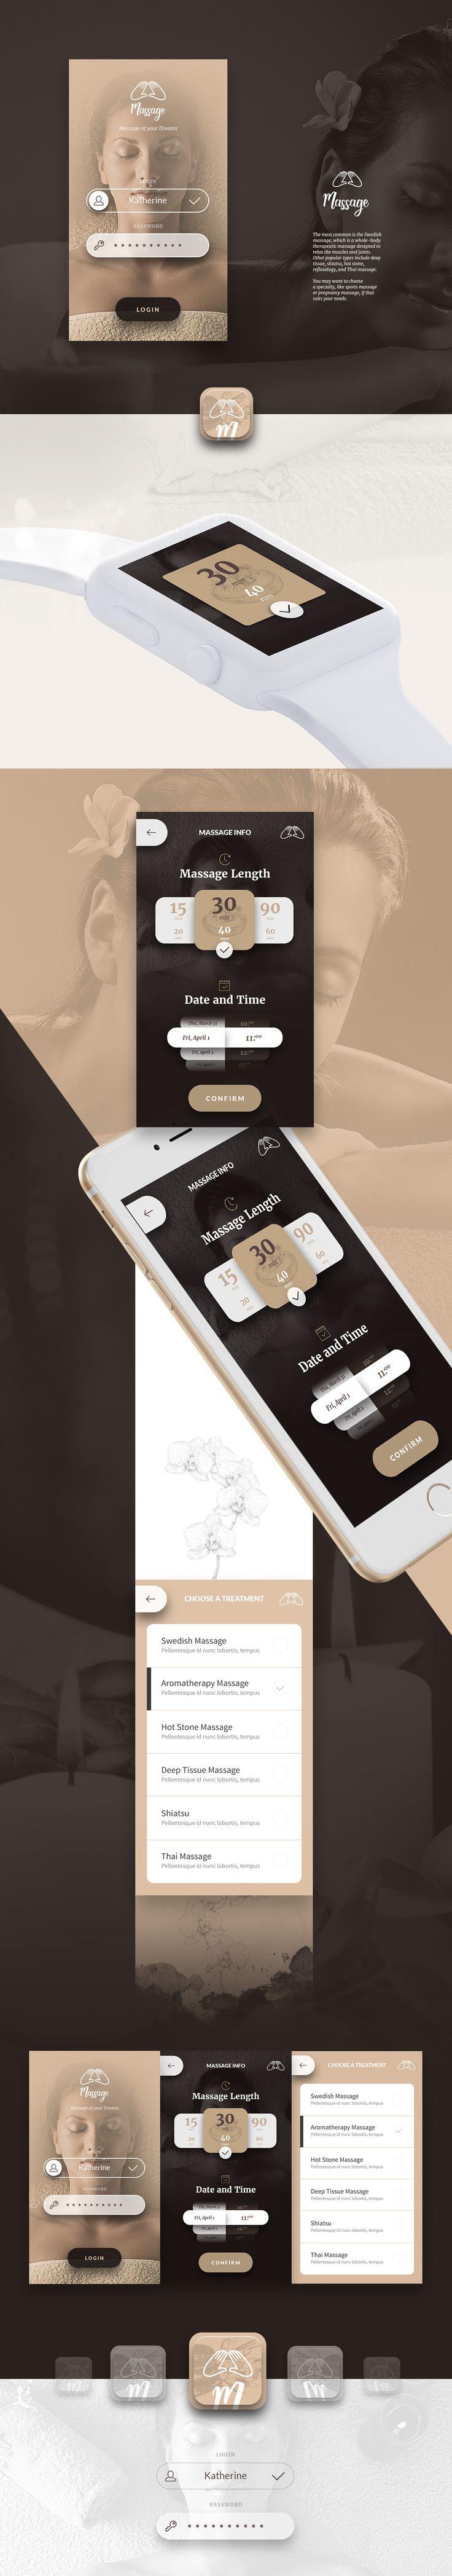 Massage The App on Behance